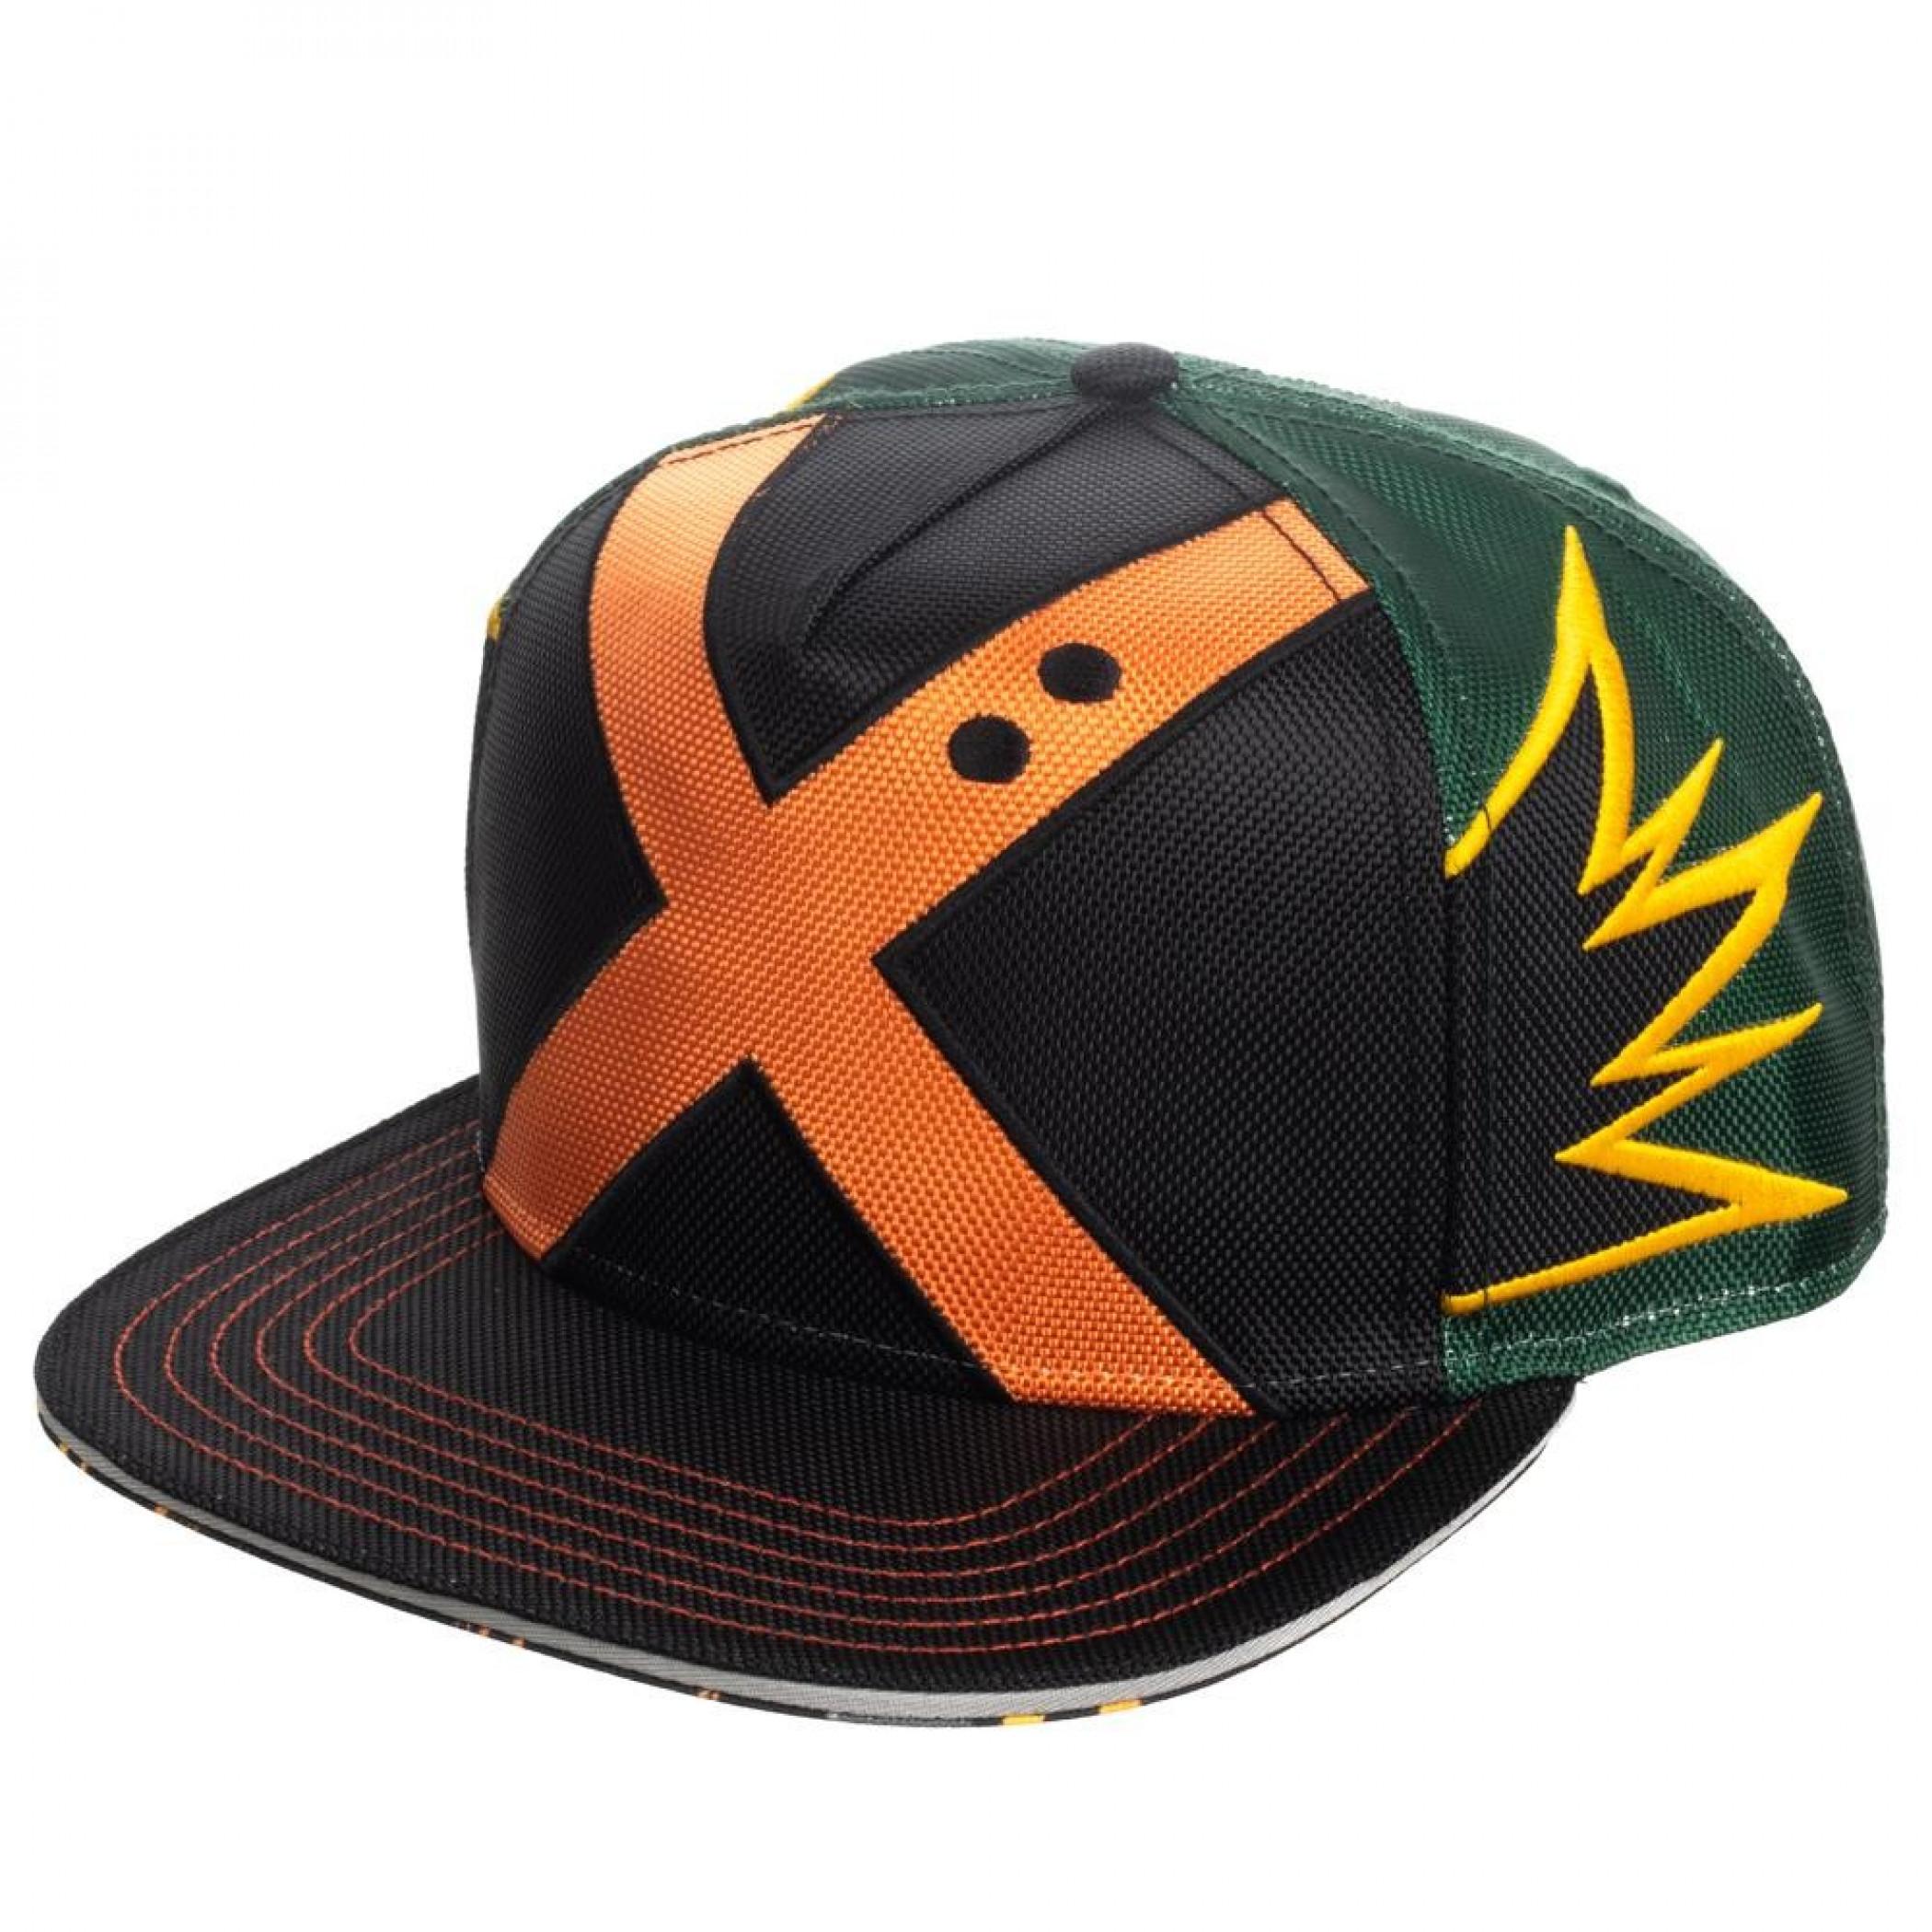 My Hero Academia Bakugo Suit Up Snapback Hat